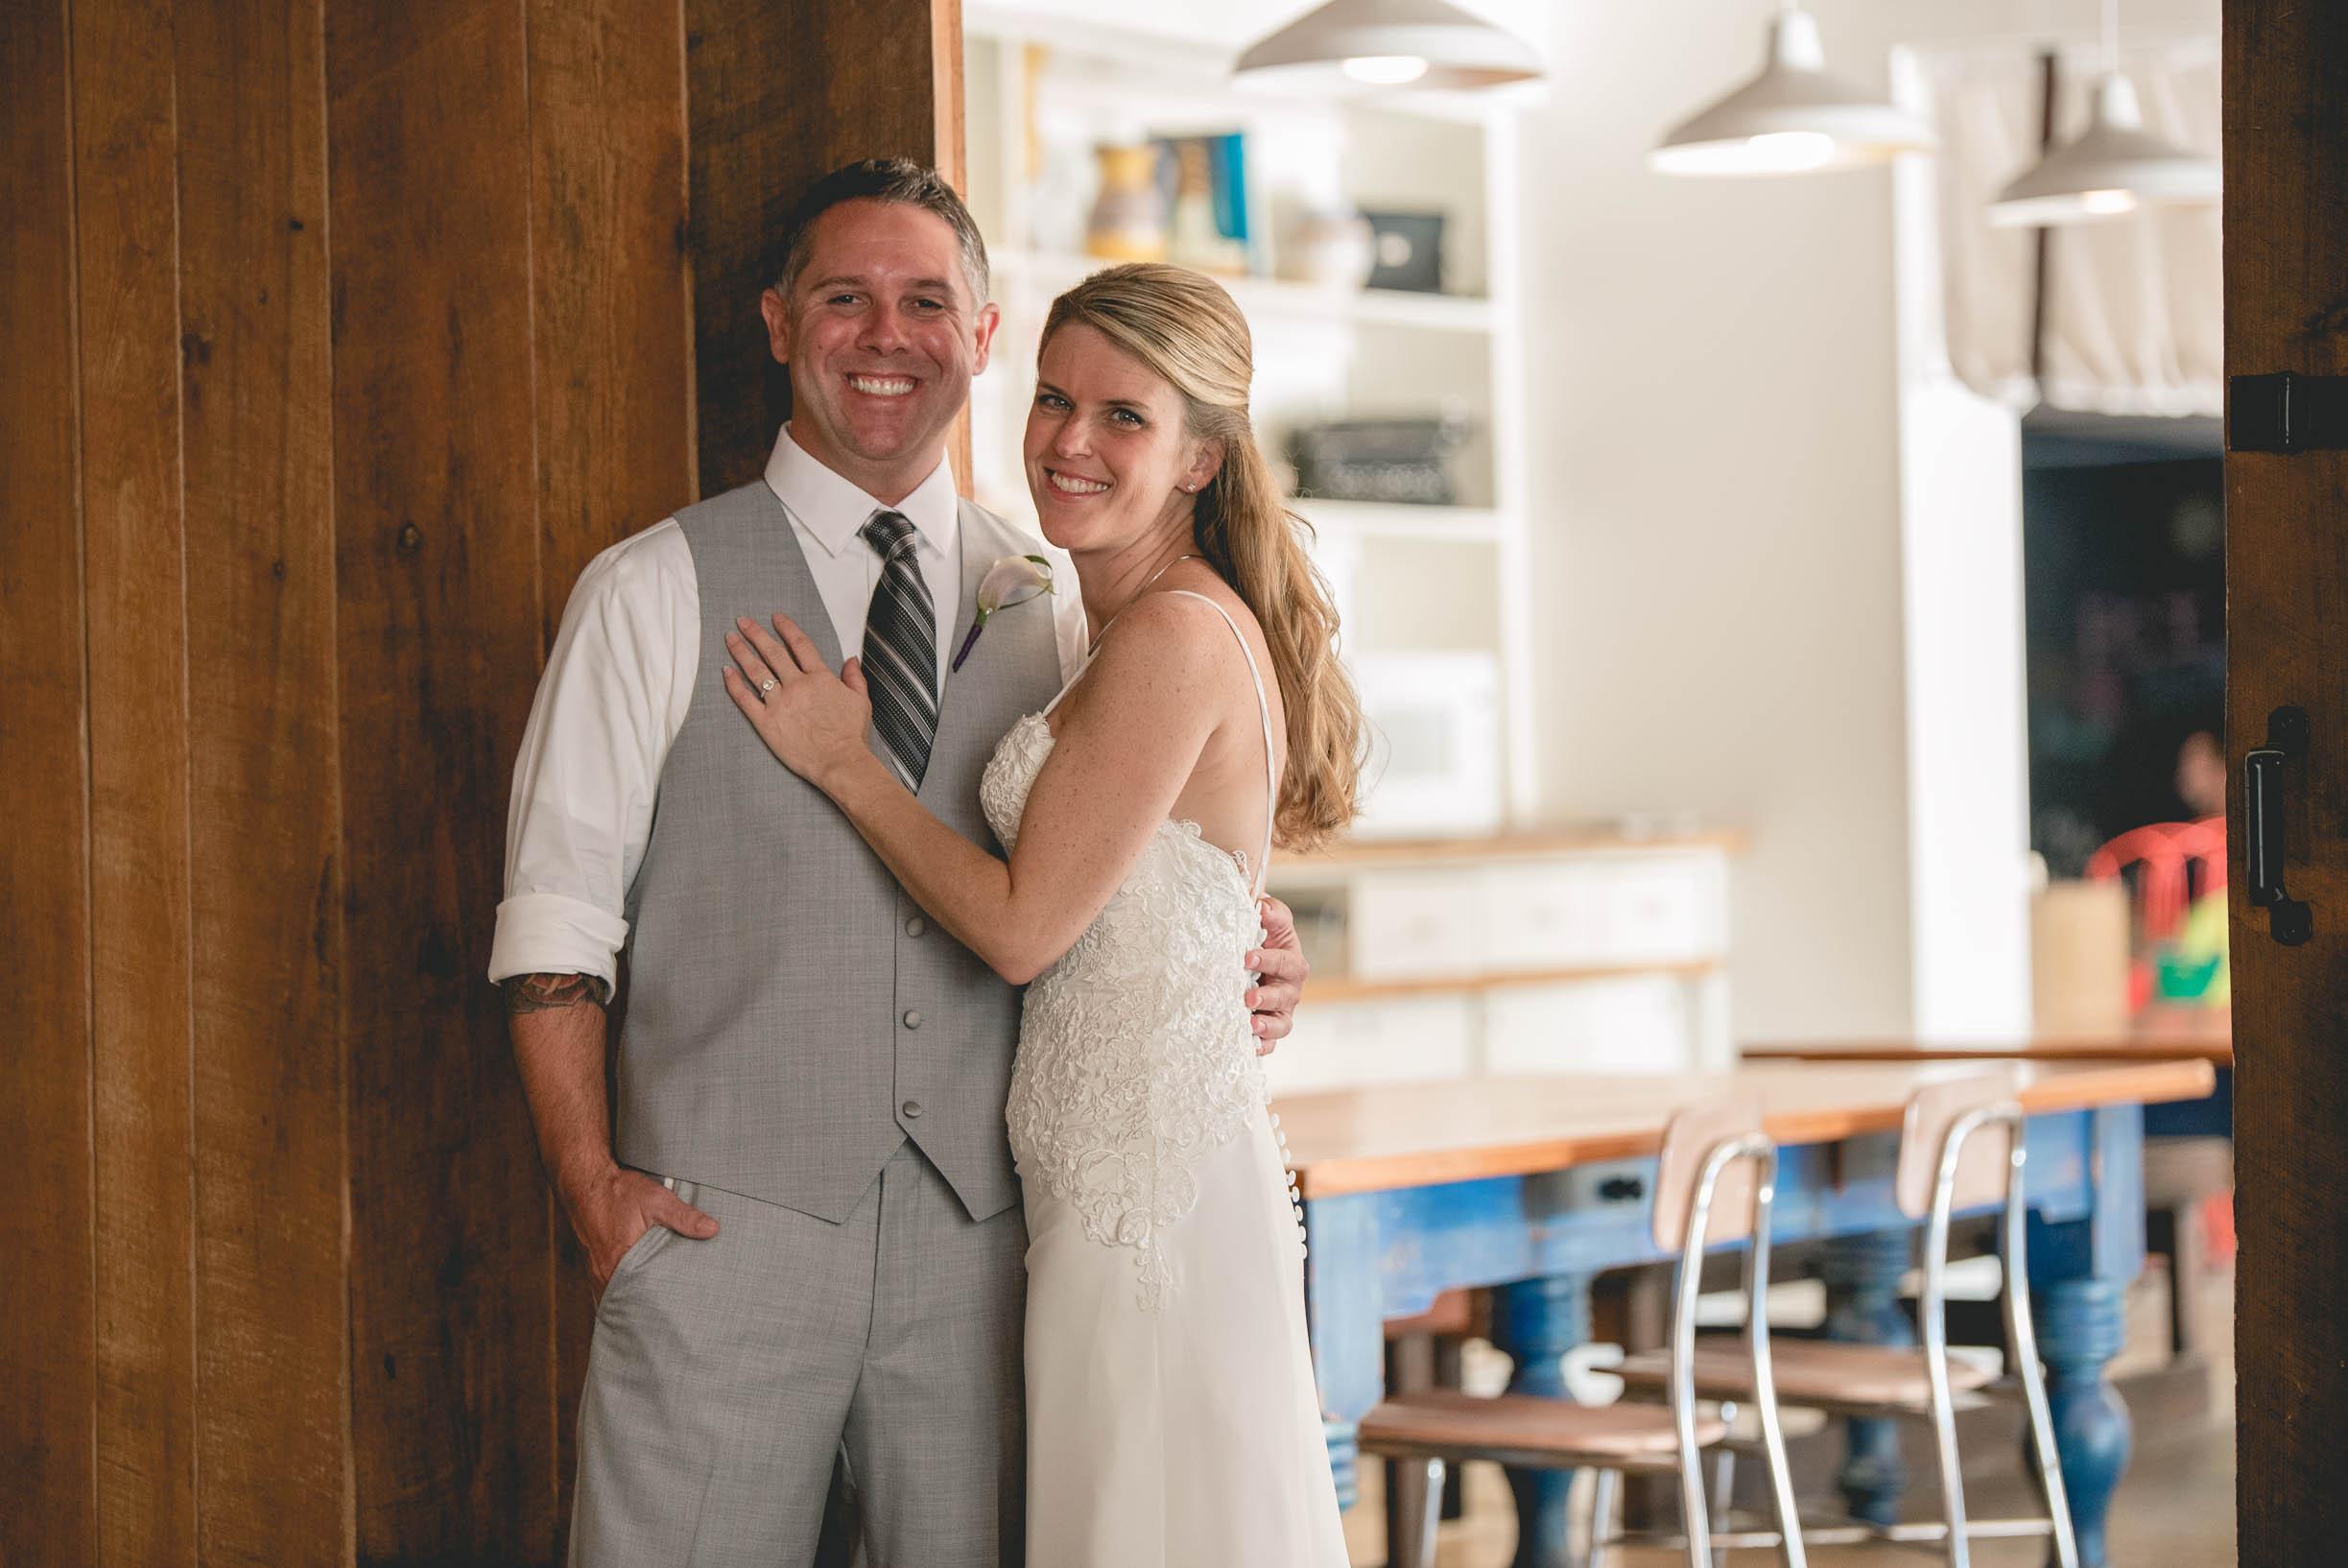 025Portland Wedding Photographer timothy capp.jpg